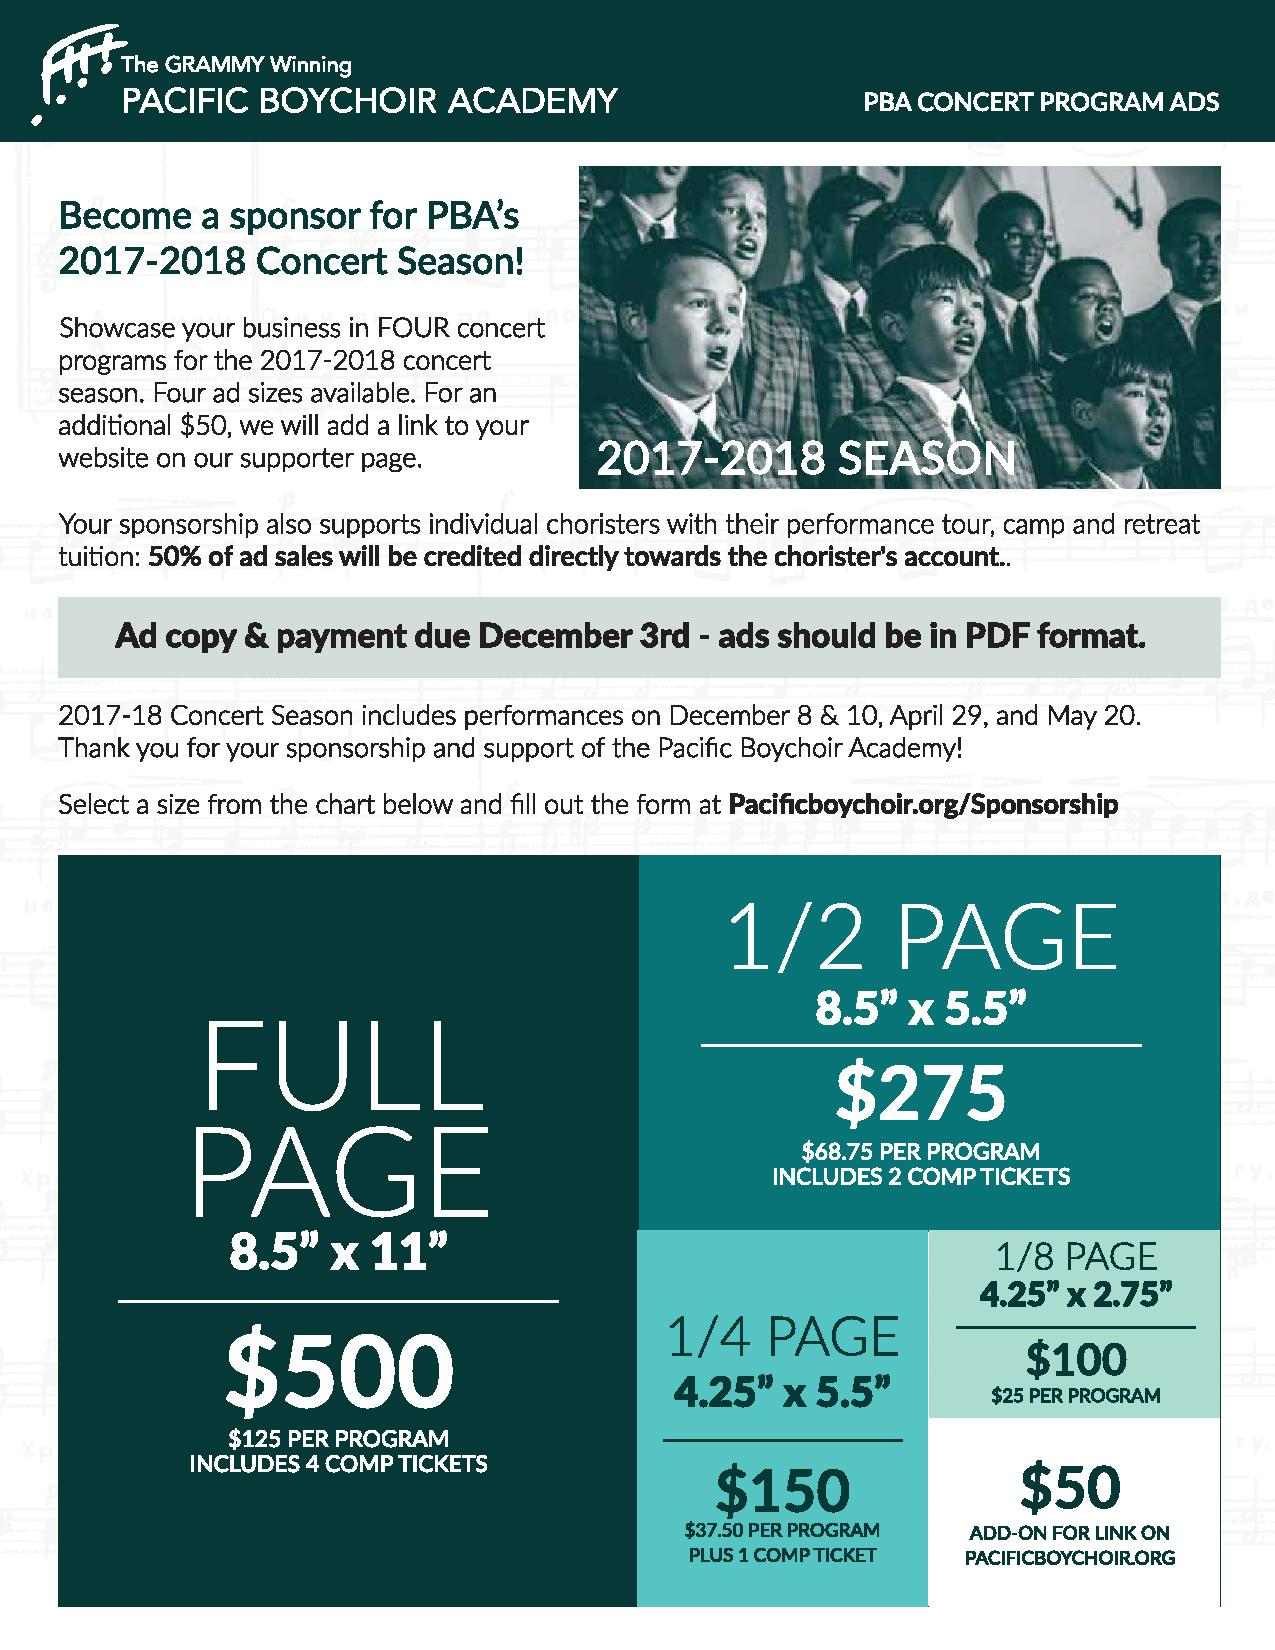 PBA_programAds_v3_lowres (1)-page-001.jpg